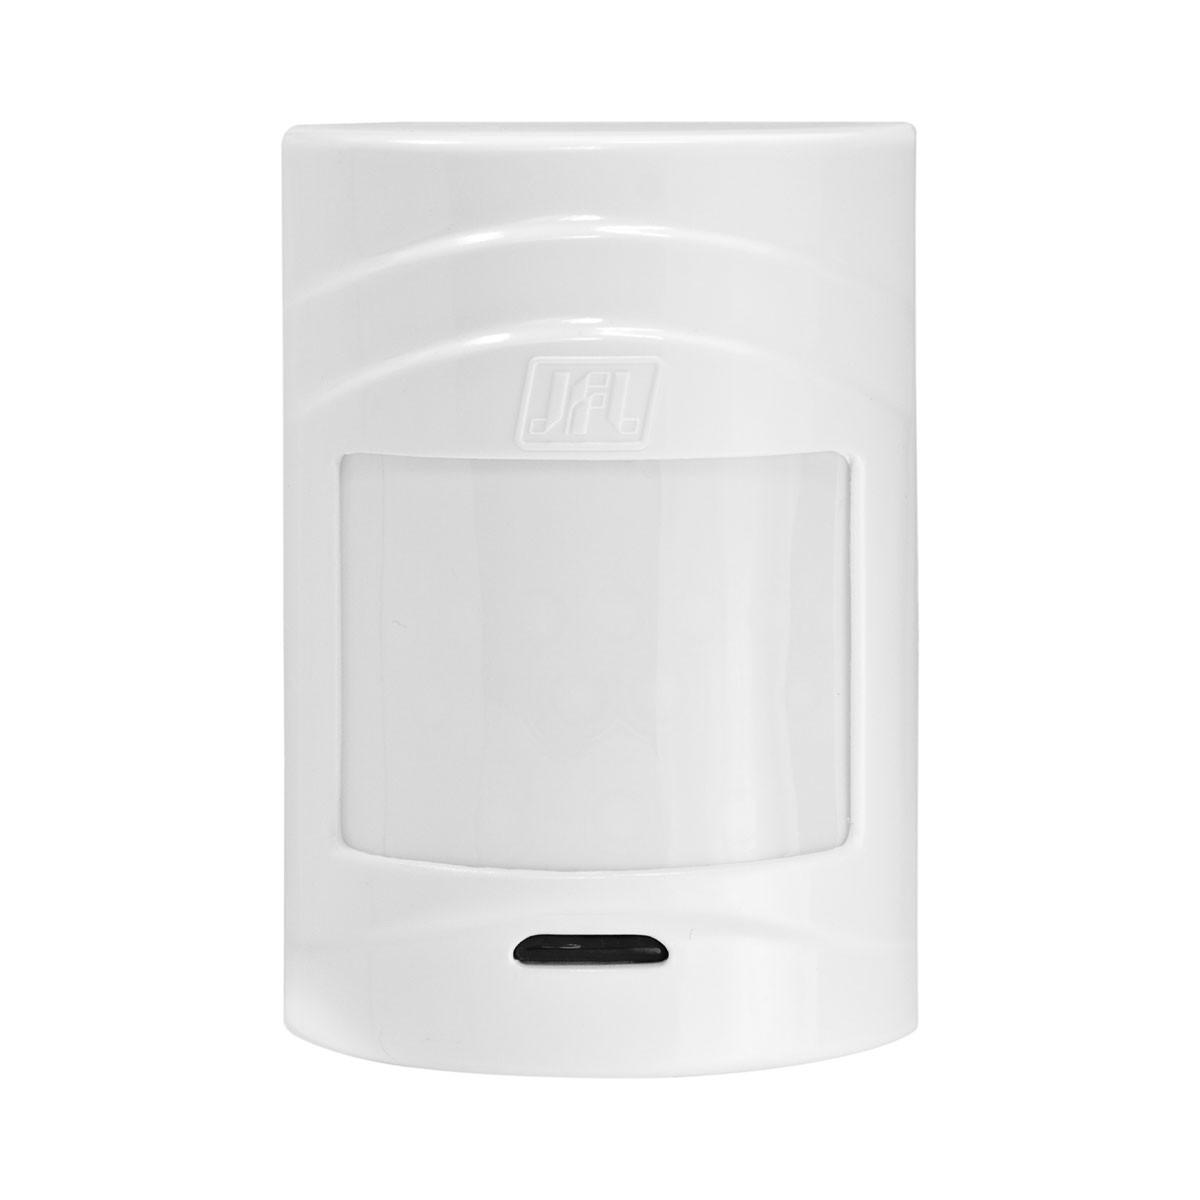 Kit Alarme Jfl SmartCloud 18 Sensores ShC Fit – Ird 640 e IrPet 530 Sf